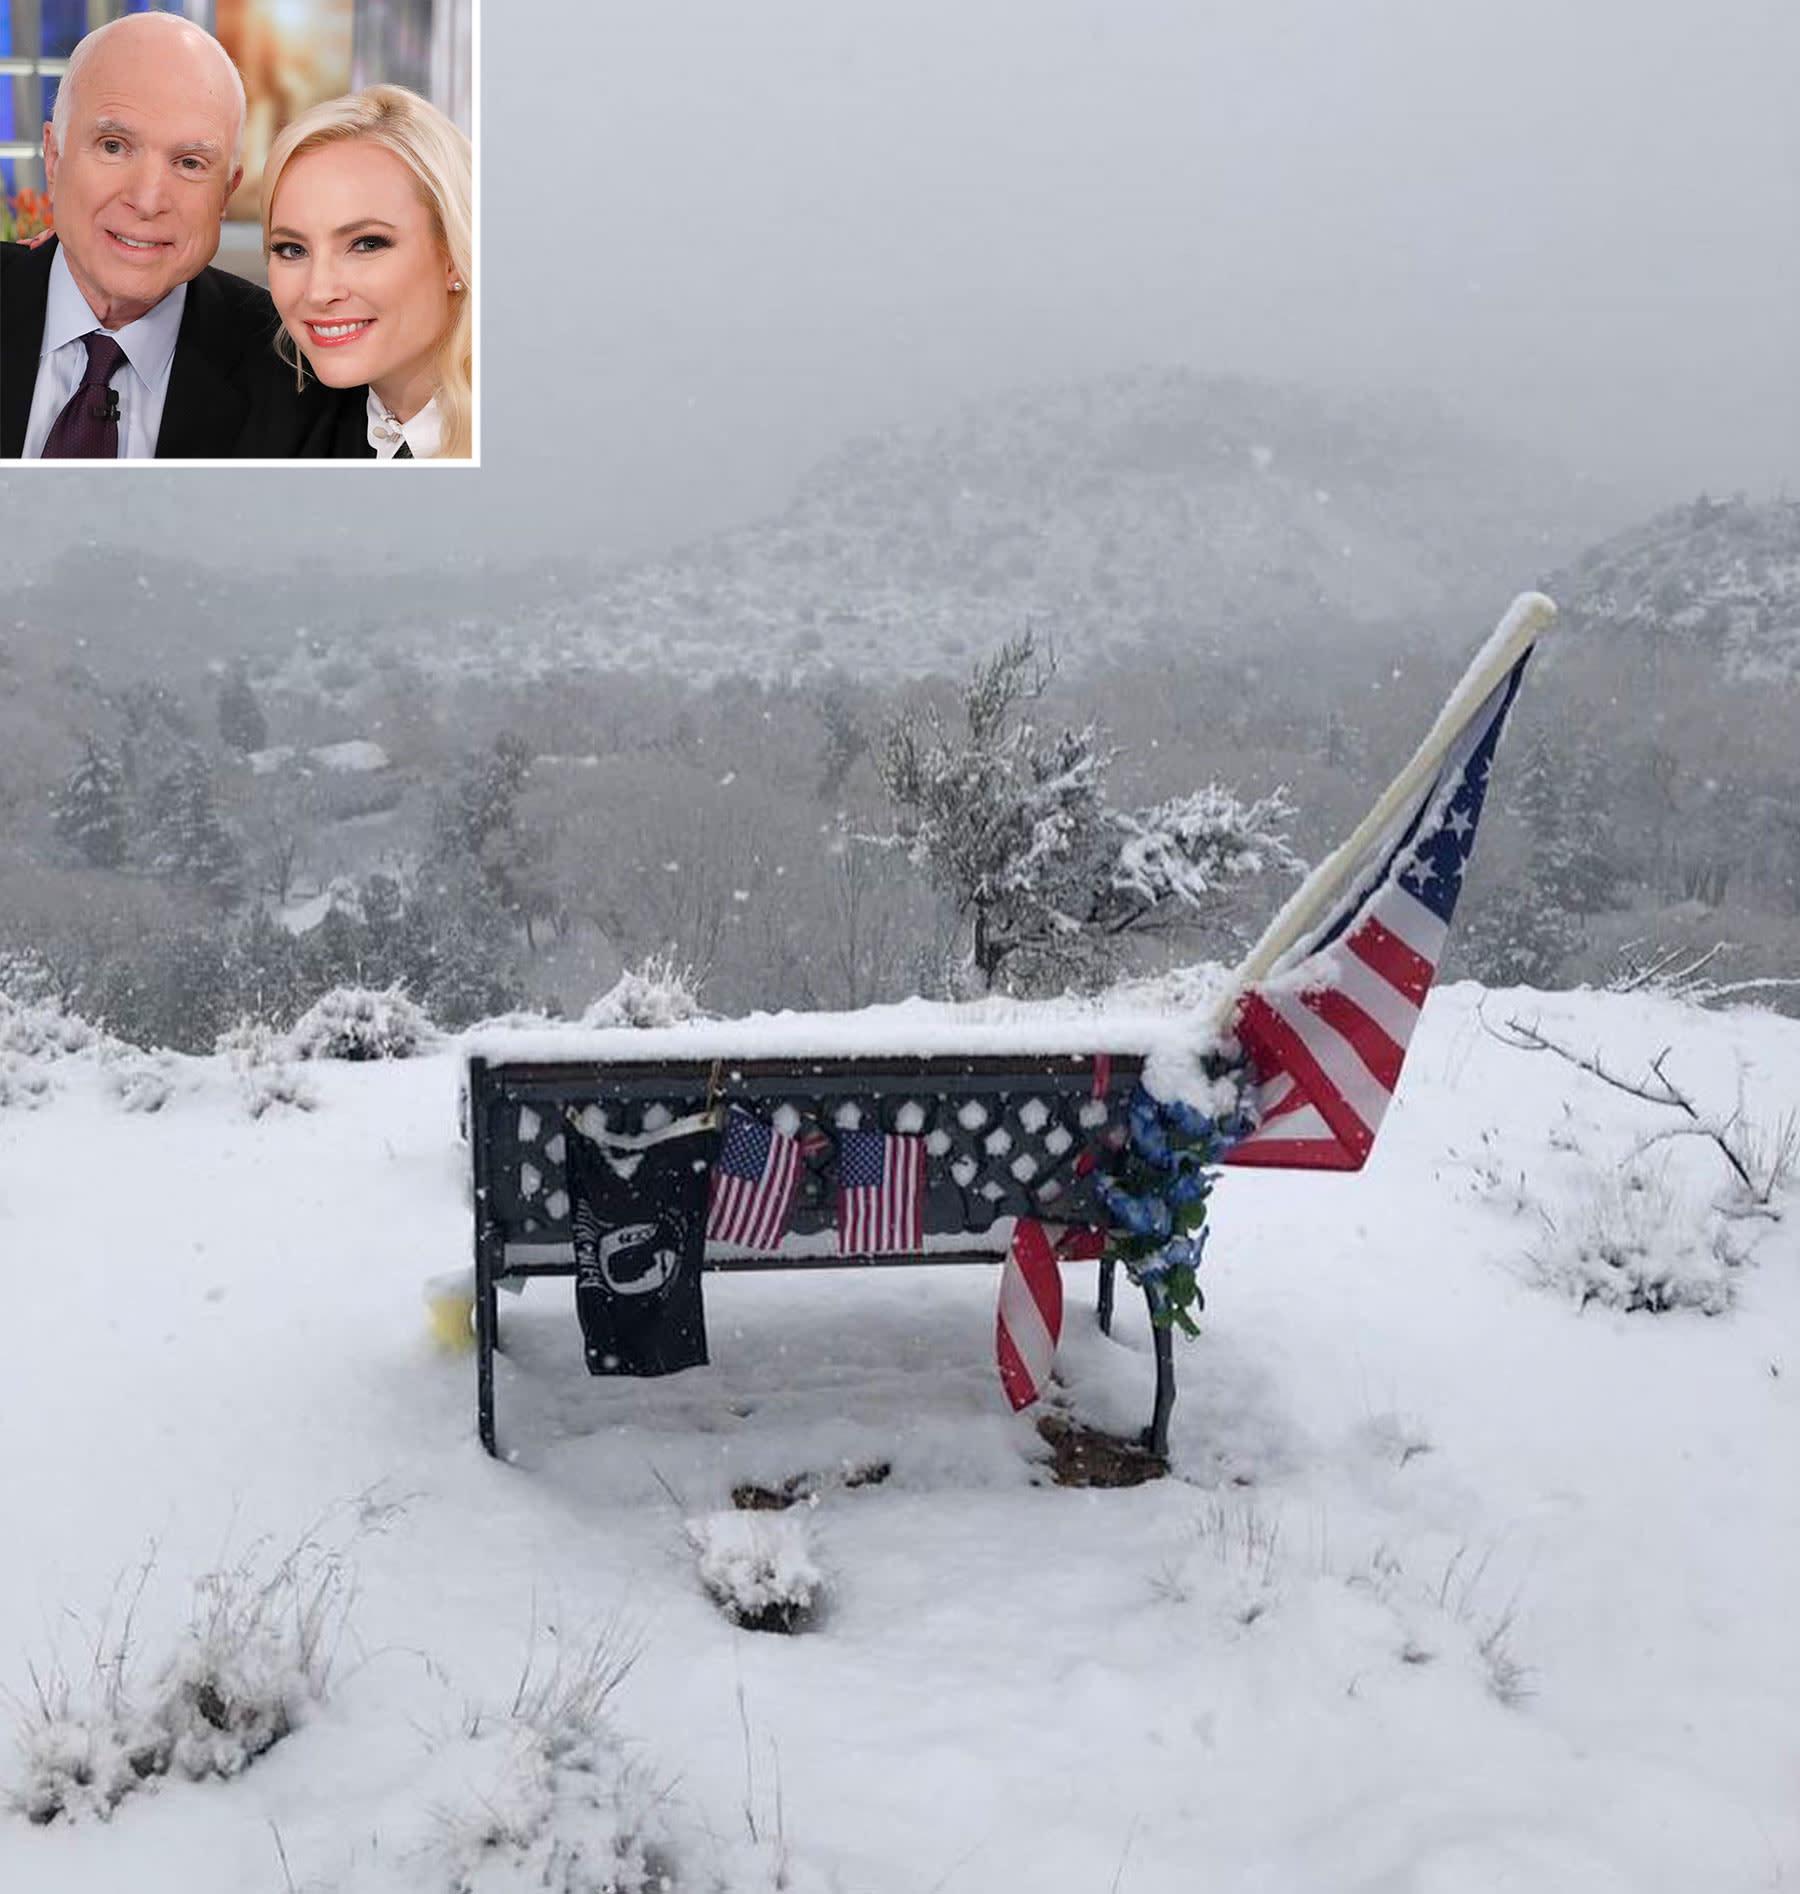 Meghan Mccain On Instagram: Meghan McCain Visits Late Dad John's Snowy Memorial On New